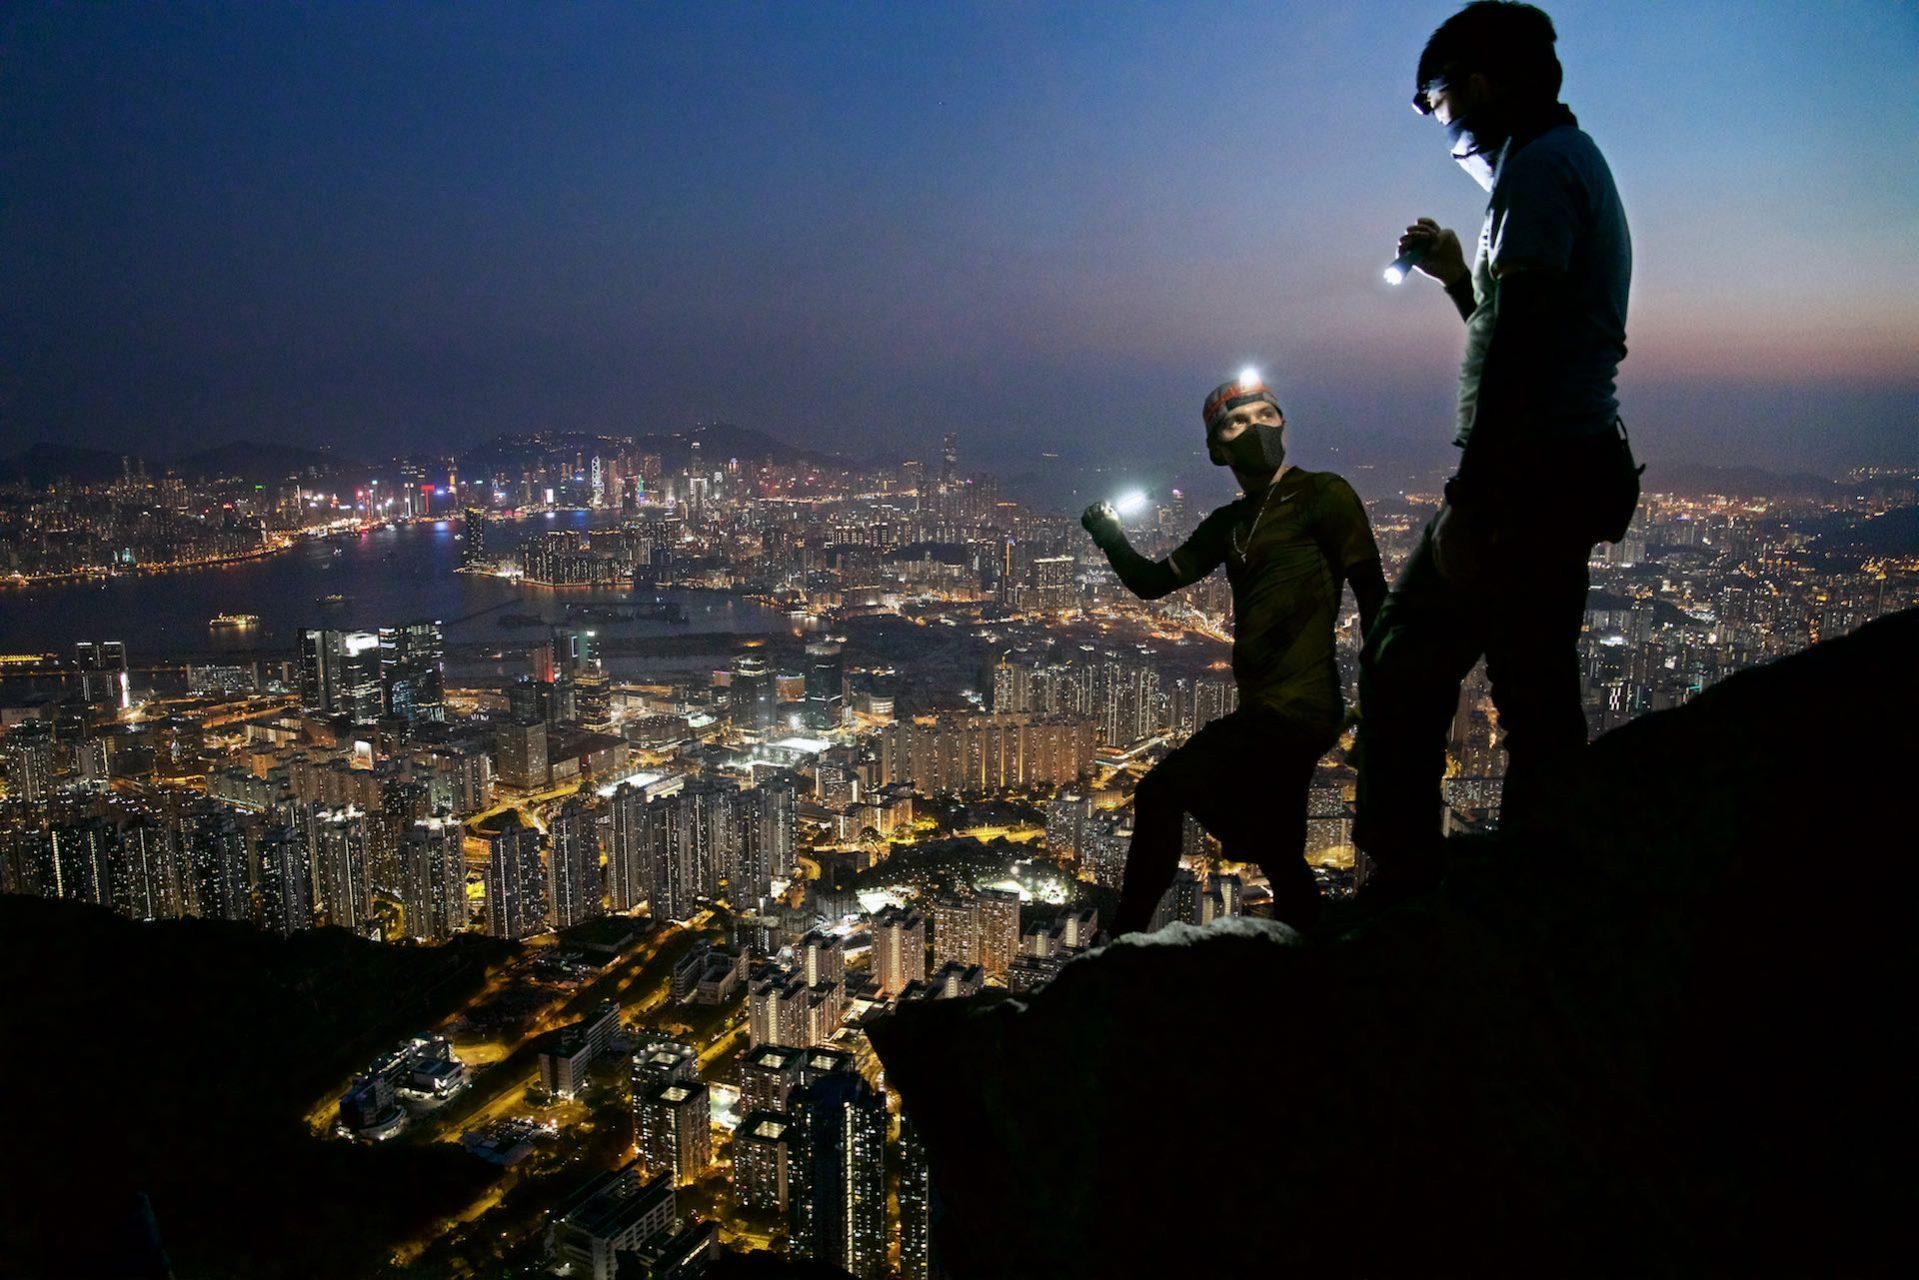 International Photographer in China